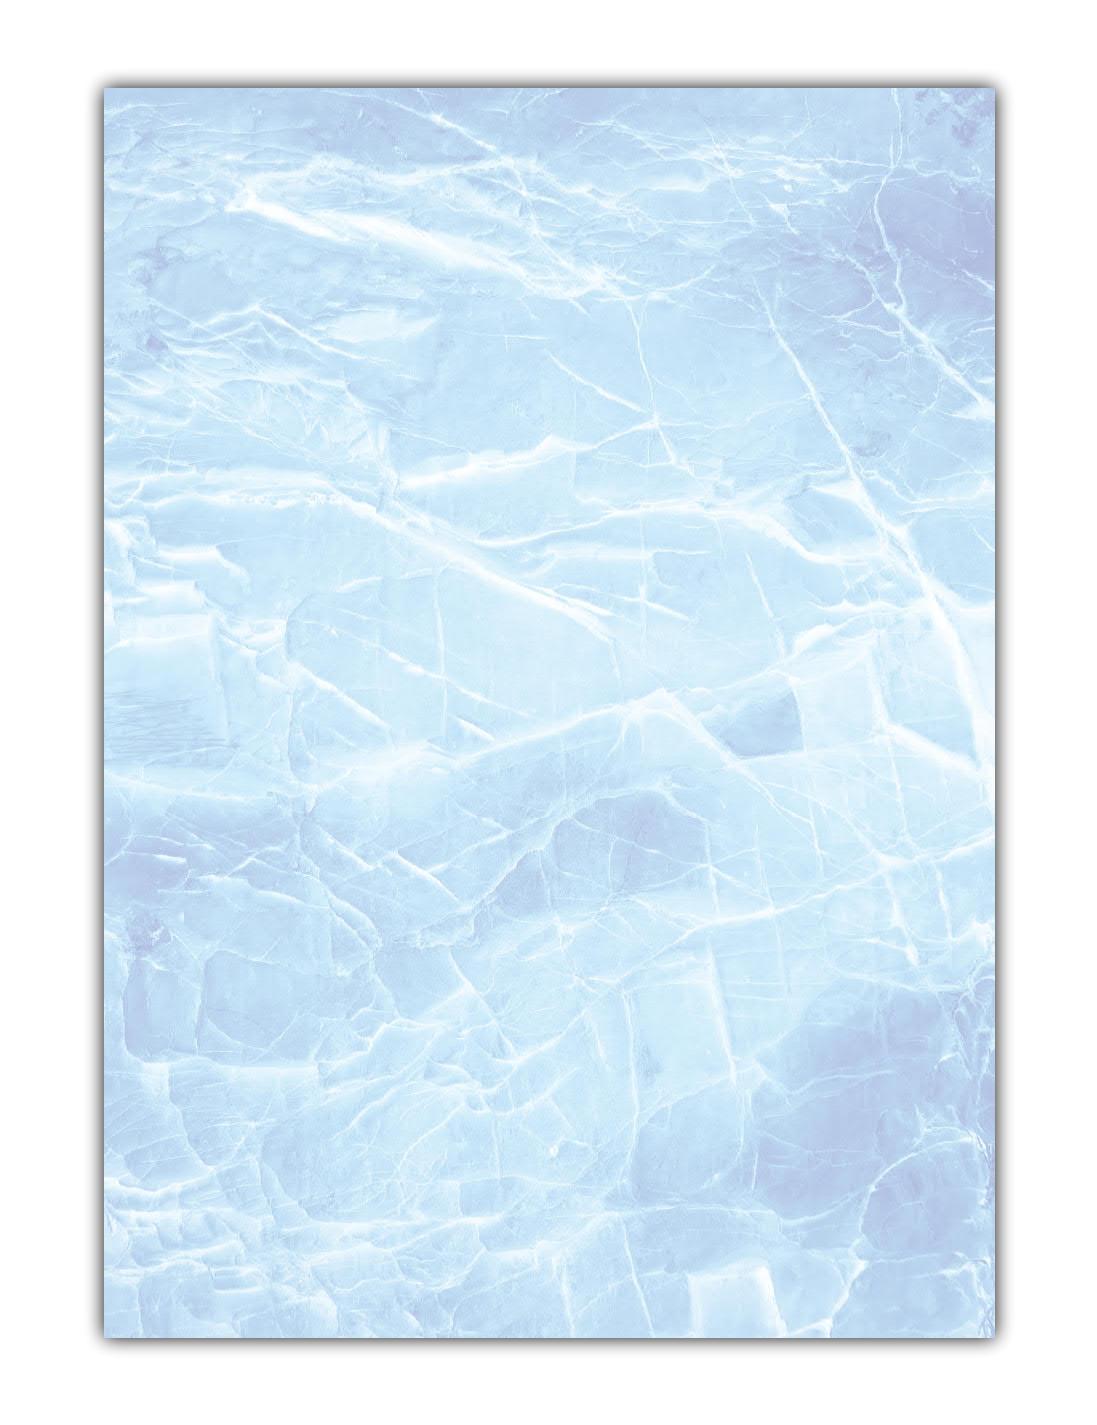 Marmorpapier Motivpapier Briefpapier (MPA-5217, DIN A4, 100 Blatt) Marmor Eis blau Gastronomie